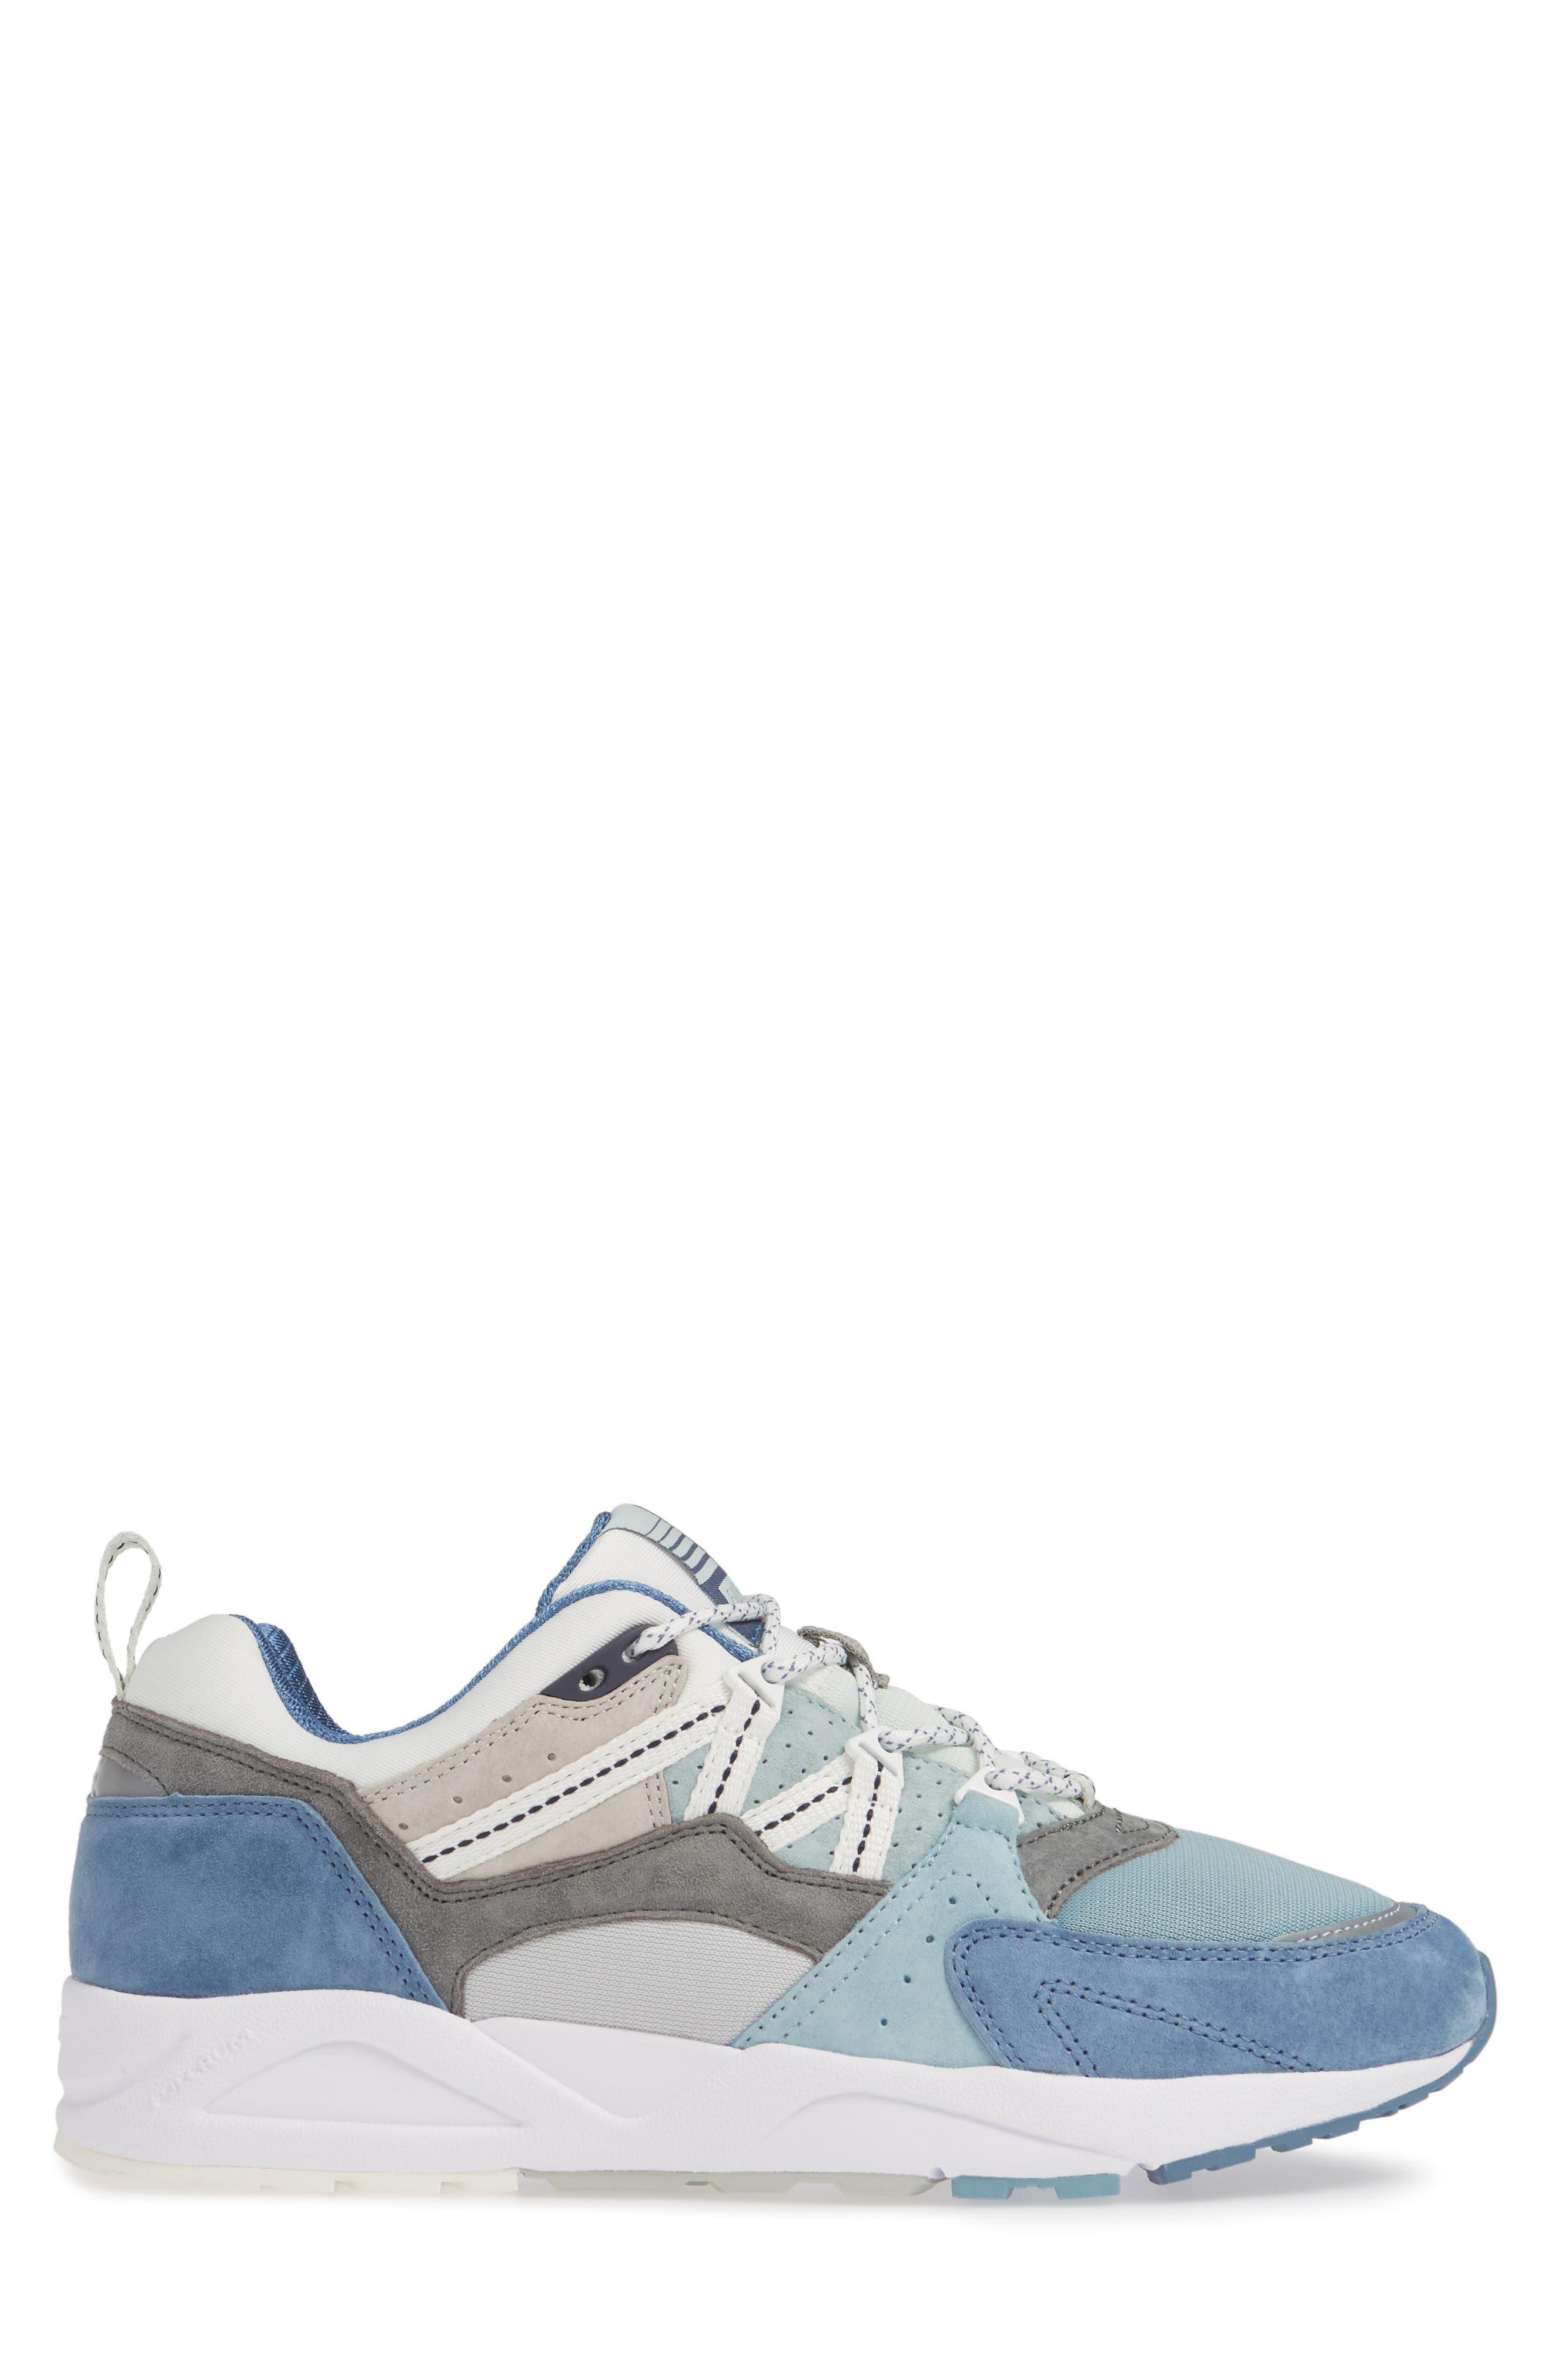 Fusion 2.0 Sneaker,                             Alternate thumbnail 3, color,                             210